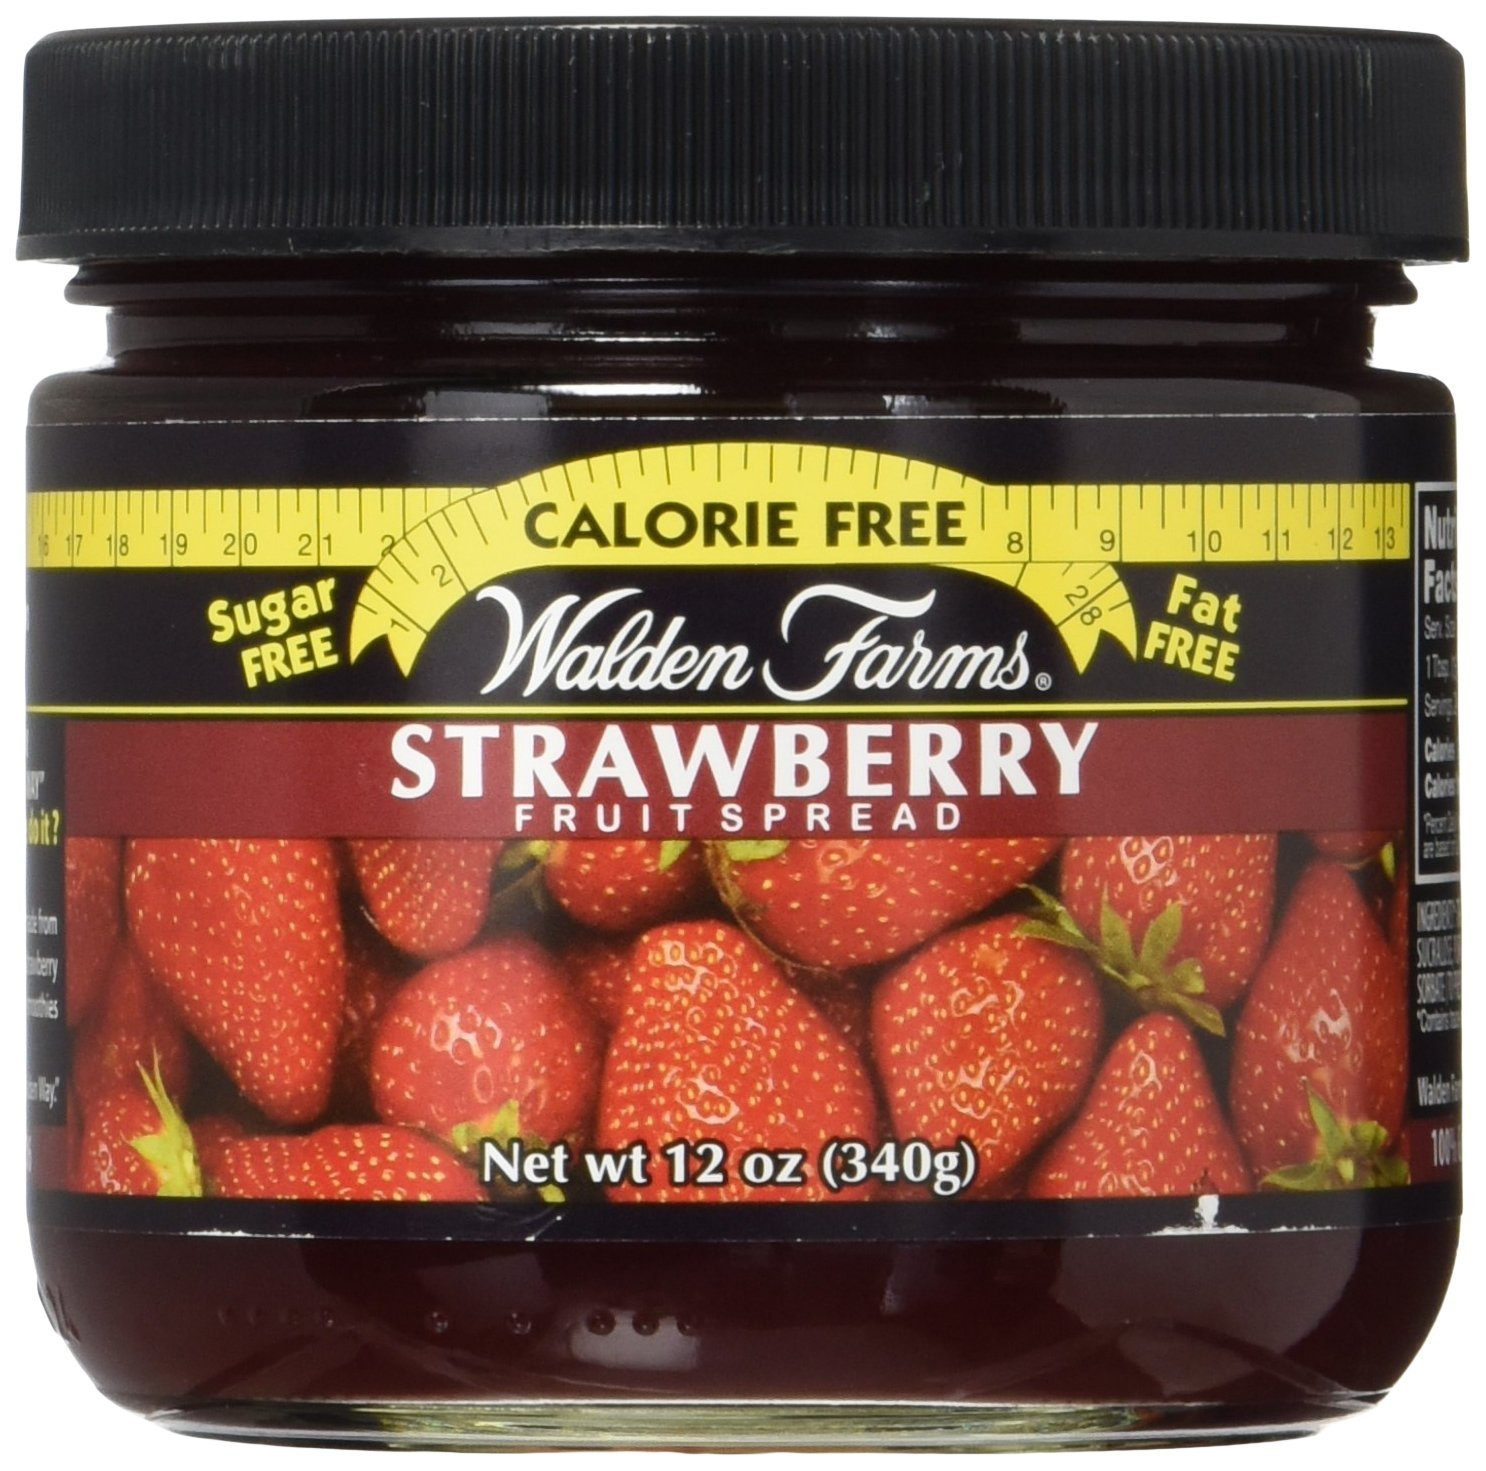 Walden Farms Calorie Free Fruit Spread, Strawberry Flavoured, 12 oz